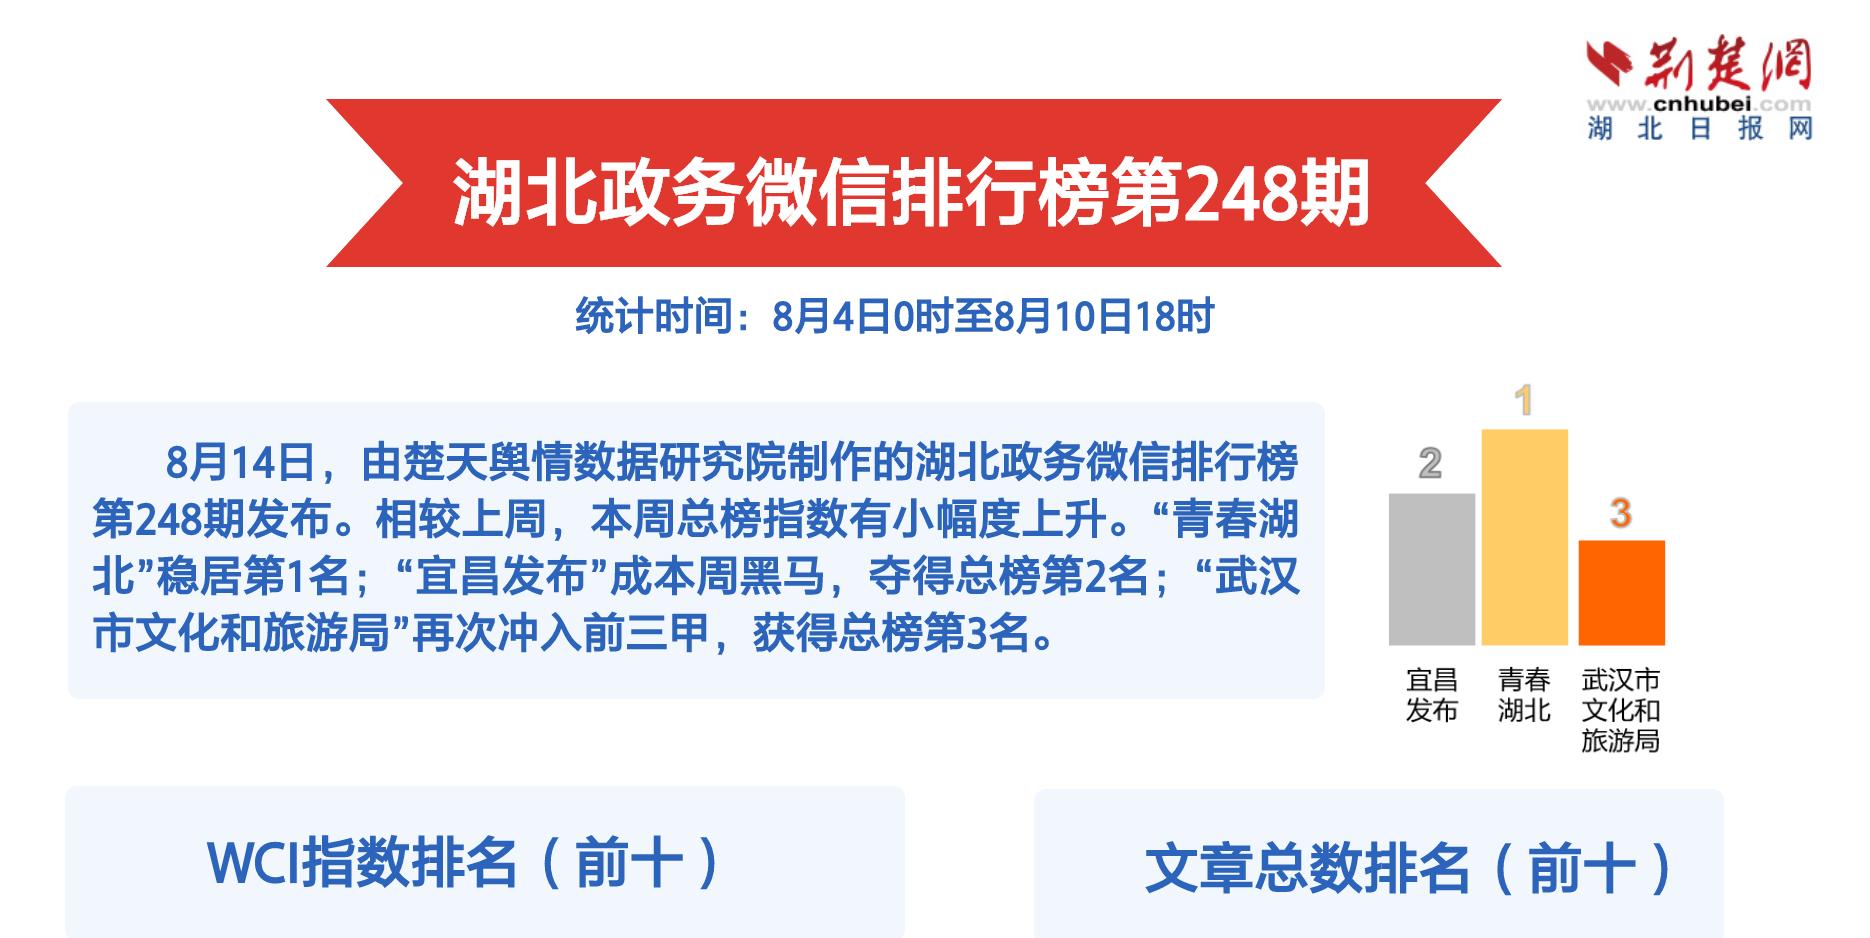 yabo亚博体育app官方下载政务微信排行榜第248期 惠民活动助燃乡村旅游节